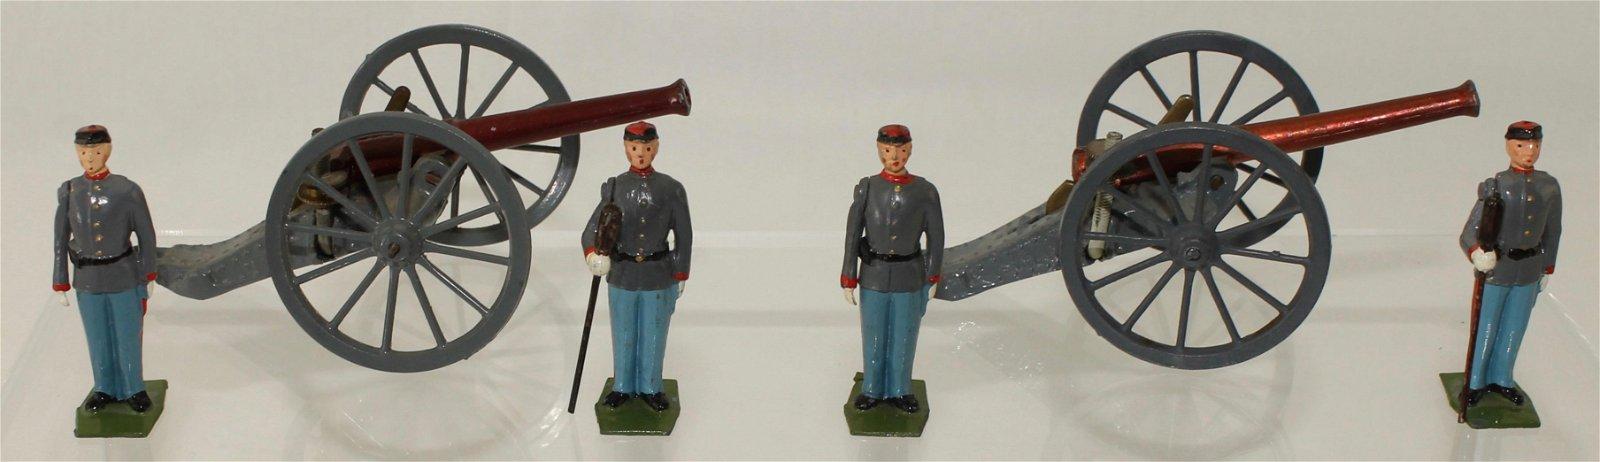 Britains Lot Set #2058 Confederate Artillery